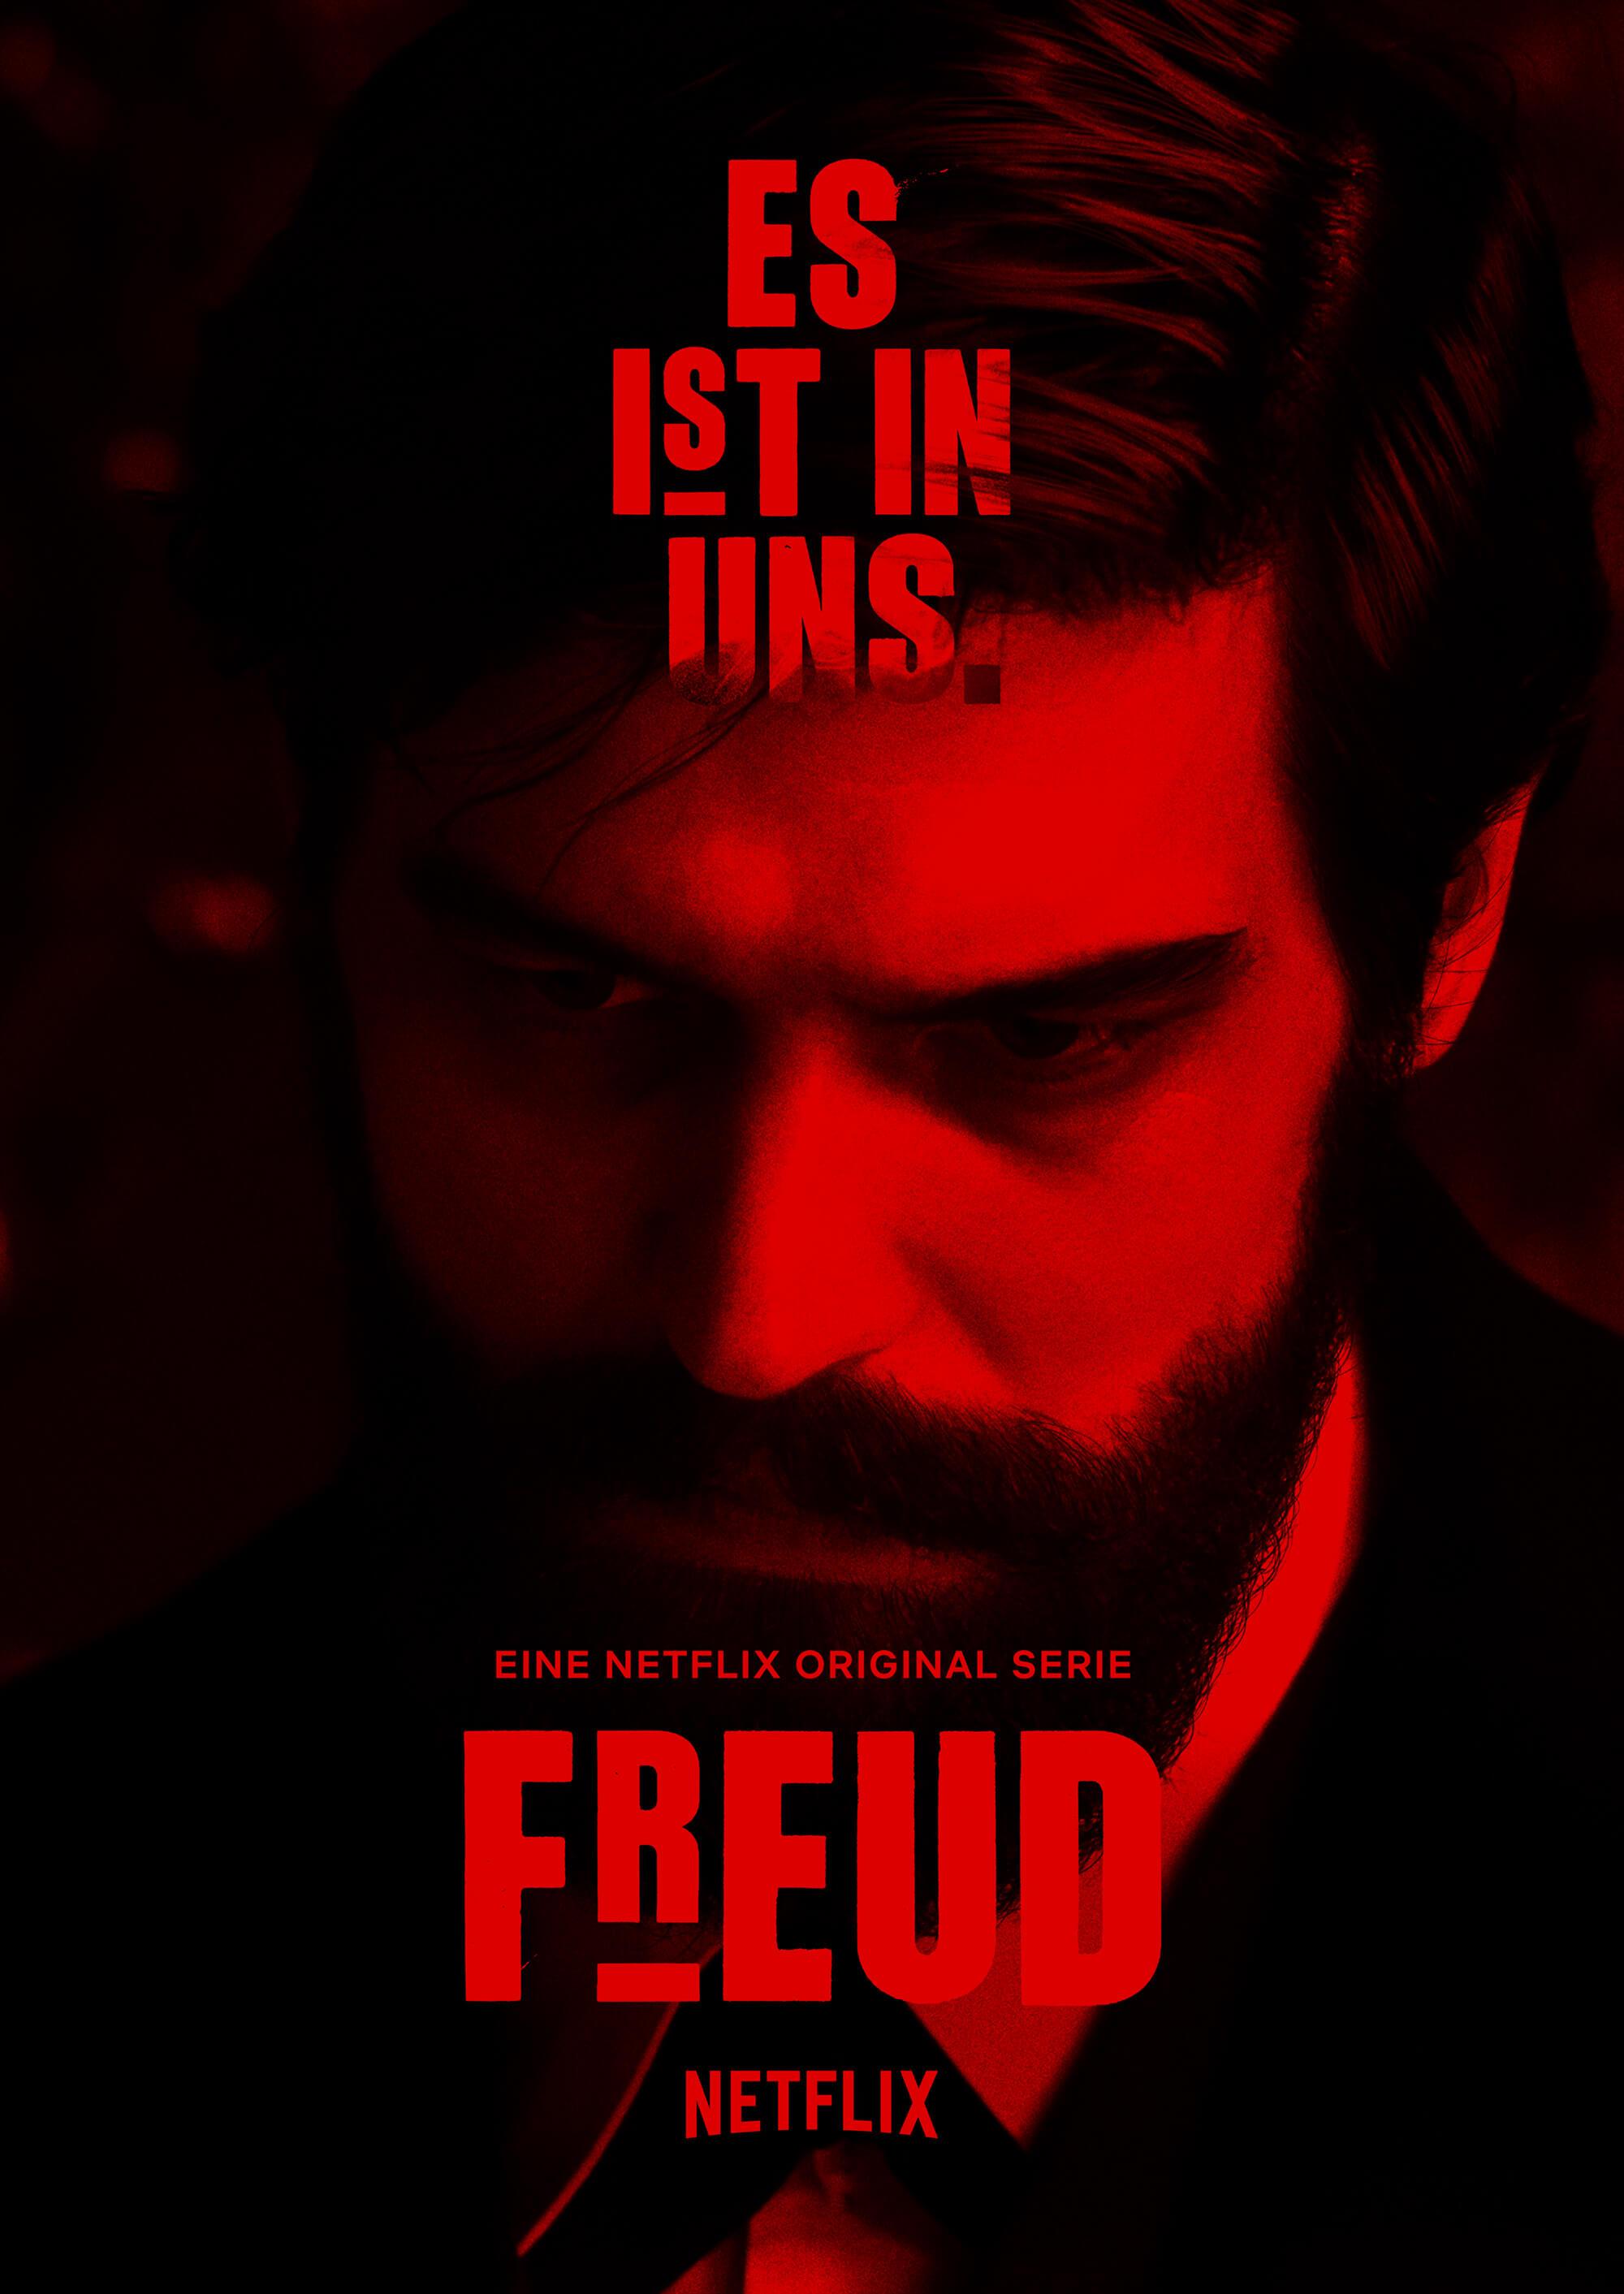 8490_FREUD_Characters_Freud_Dark_SmallSized_Headline_Freud